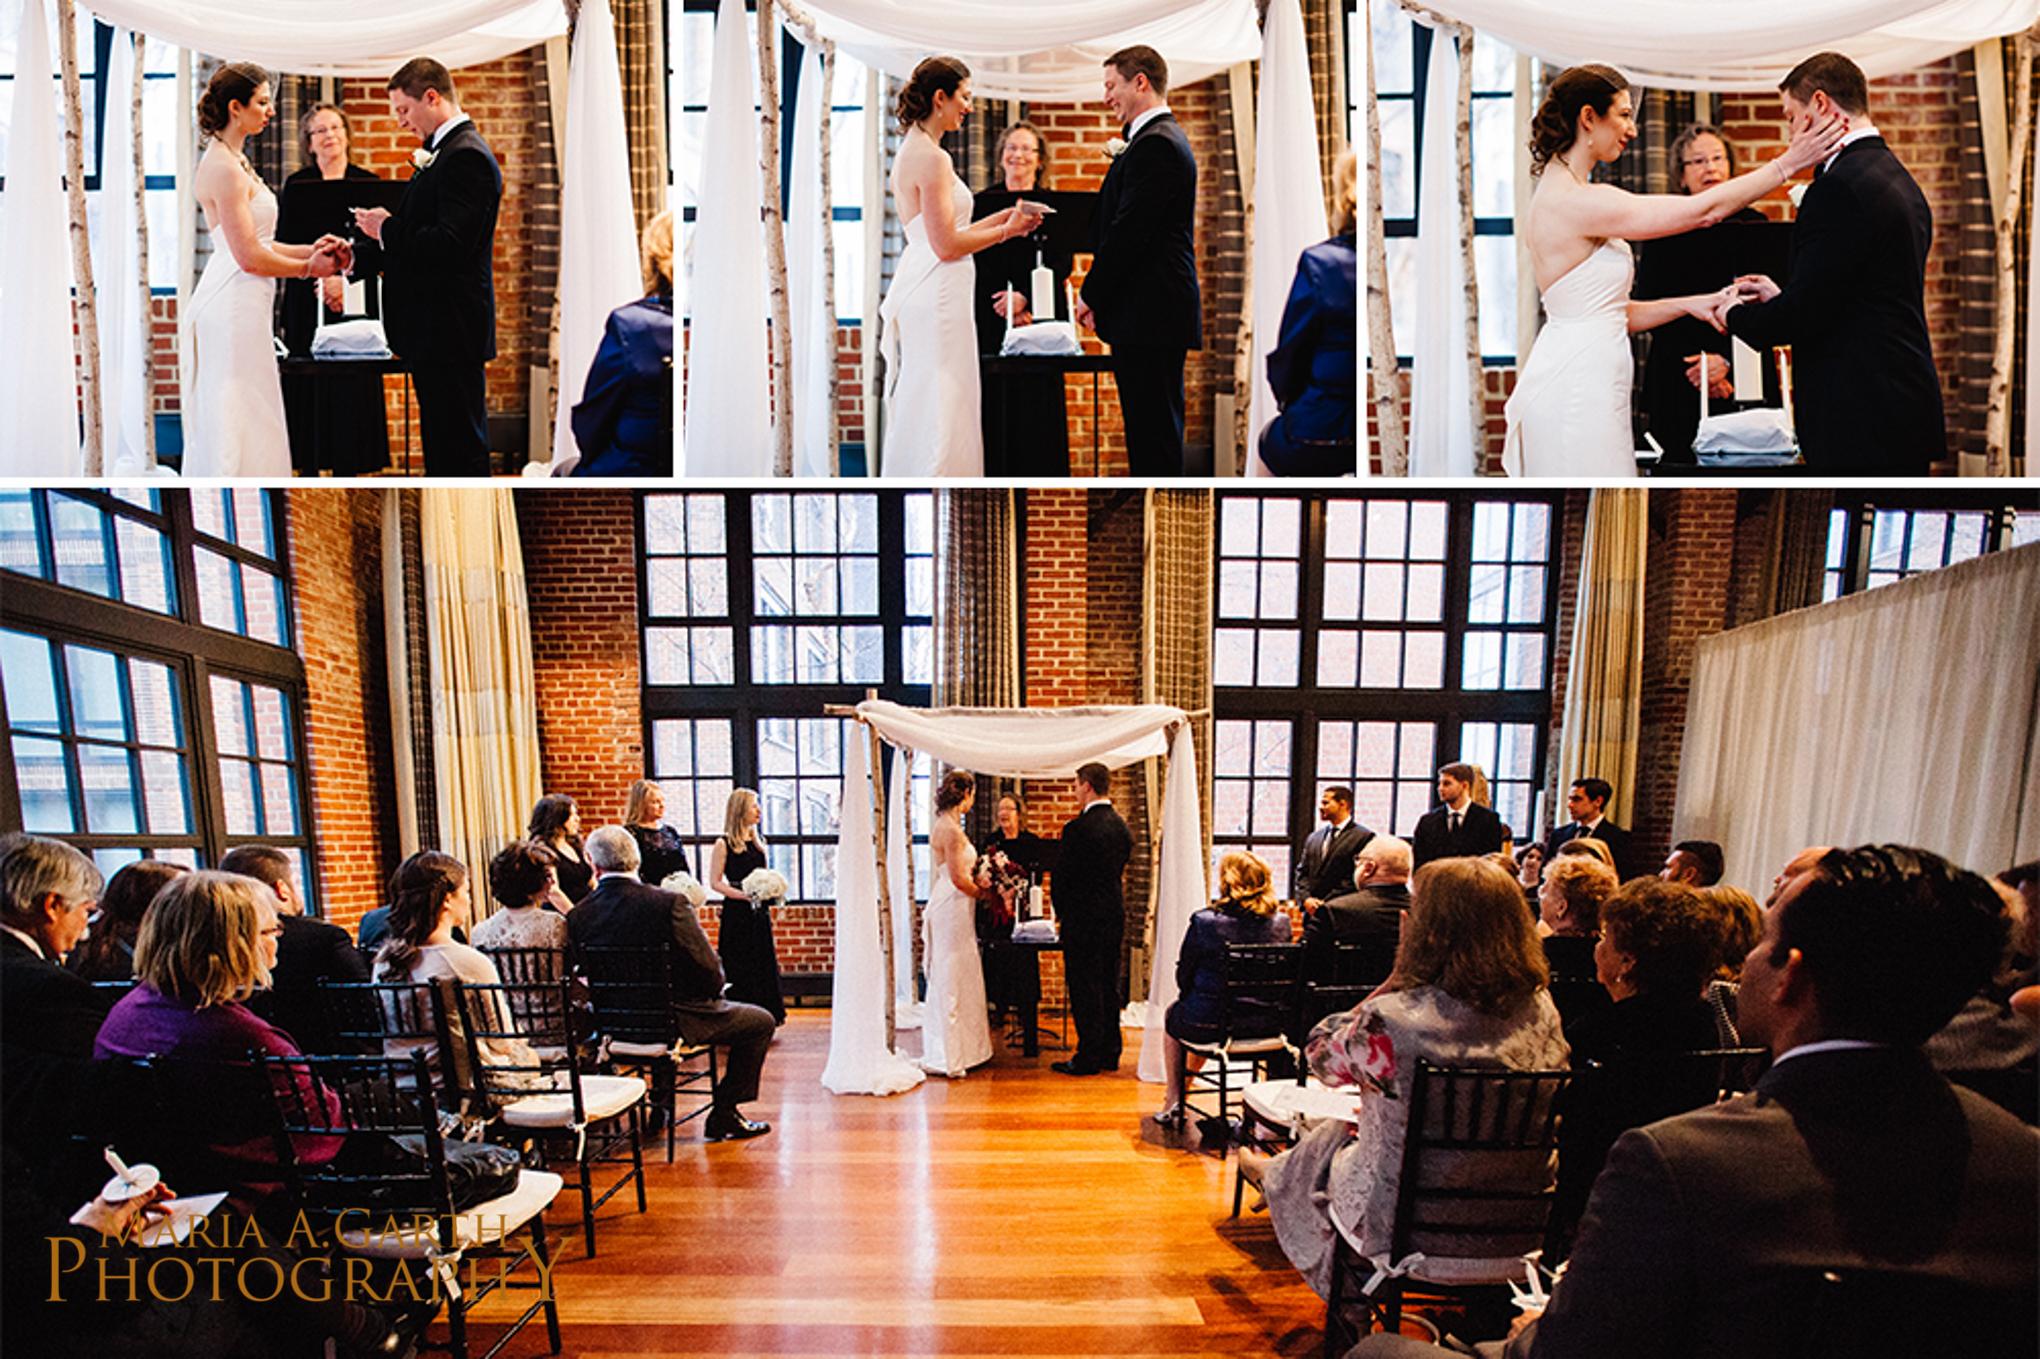 Georgetown Weddings, DC Wedding Photography, Weddings at the Ritz in DC_018.jpg